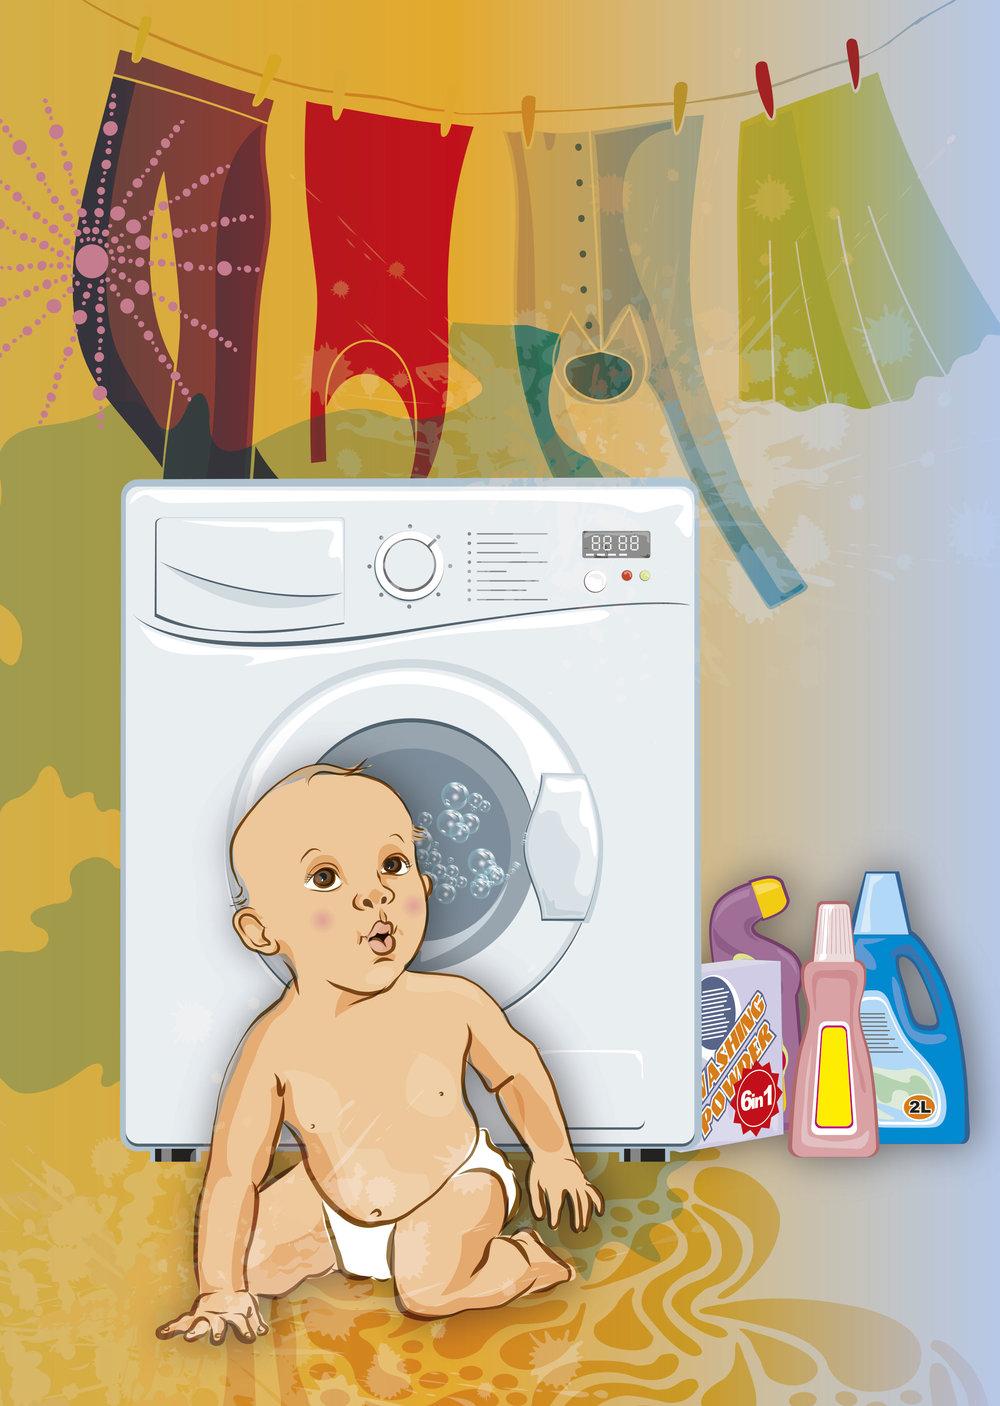 Barn-vid-tvattmaskin.jpg